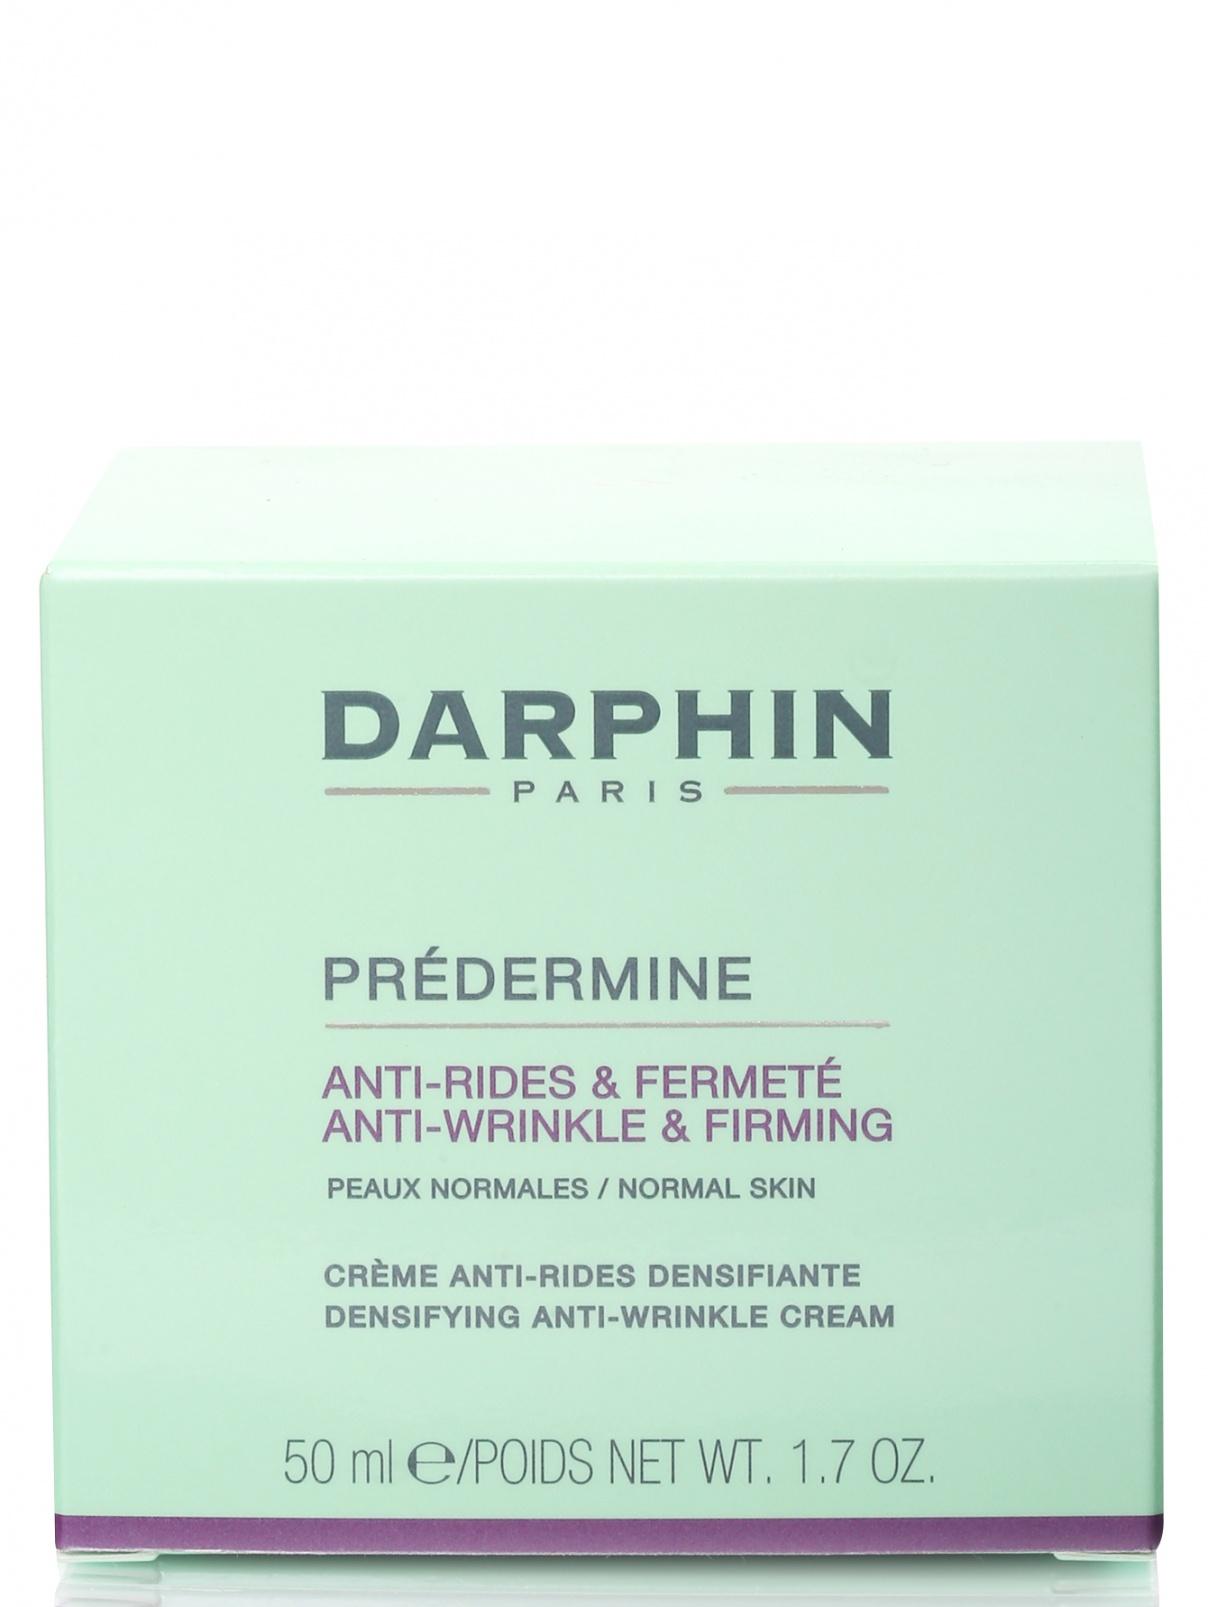 Крем против морщин Predermine - Face Care, 50ml Darphin  –  Модель Общий вид